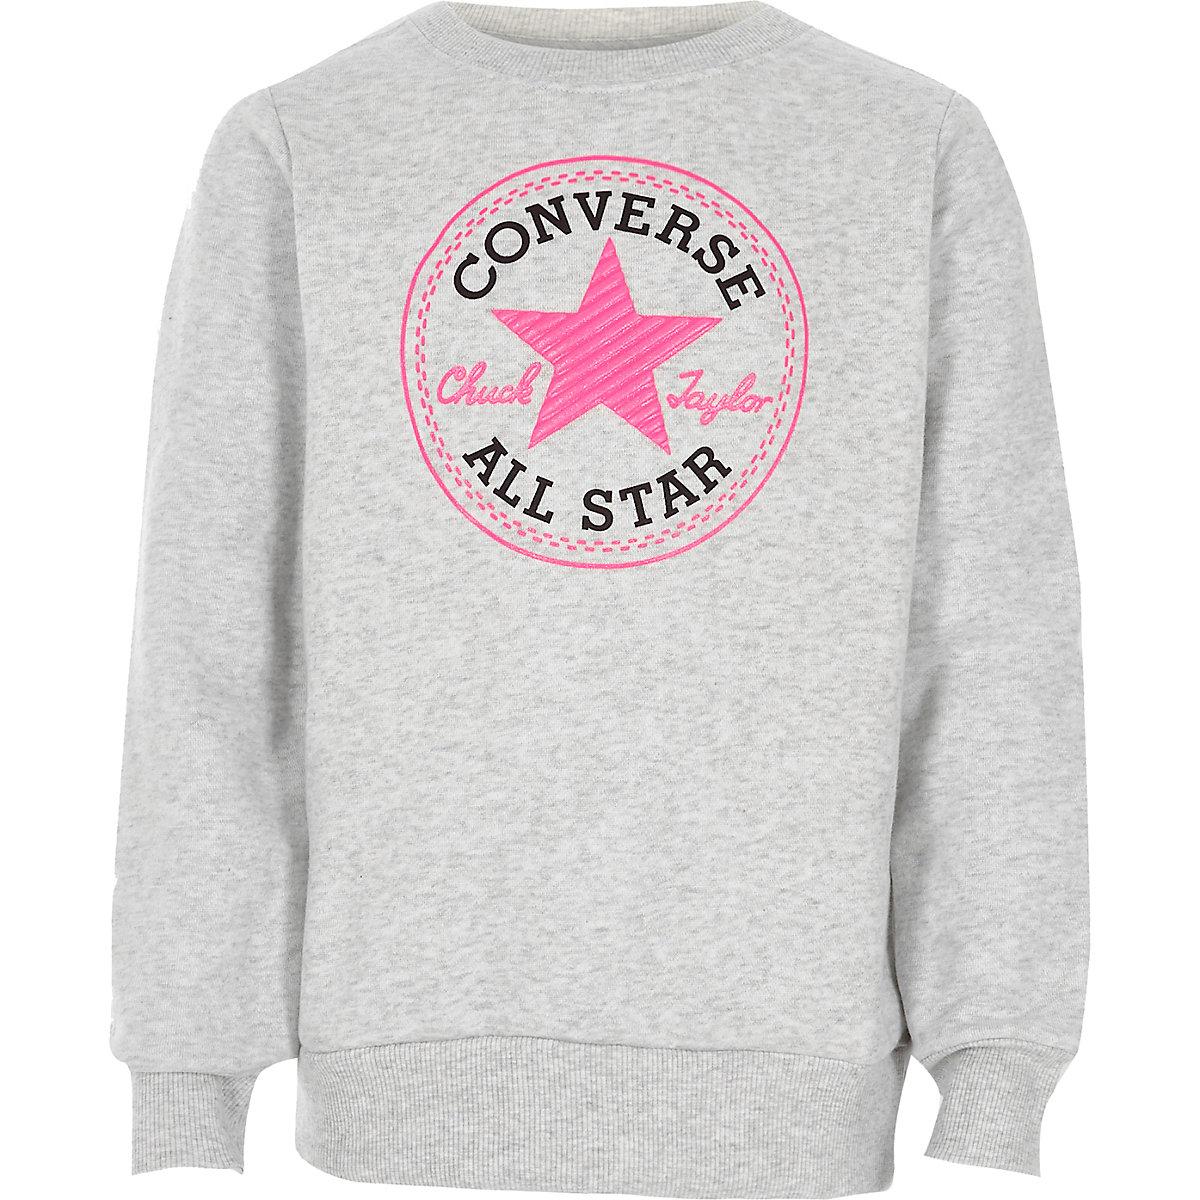 Girls Converse grey crew neck sweatshirt